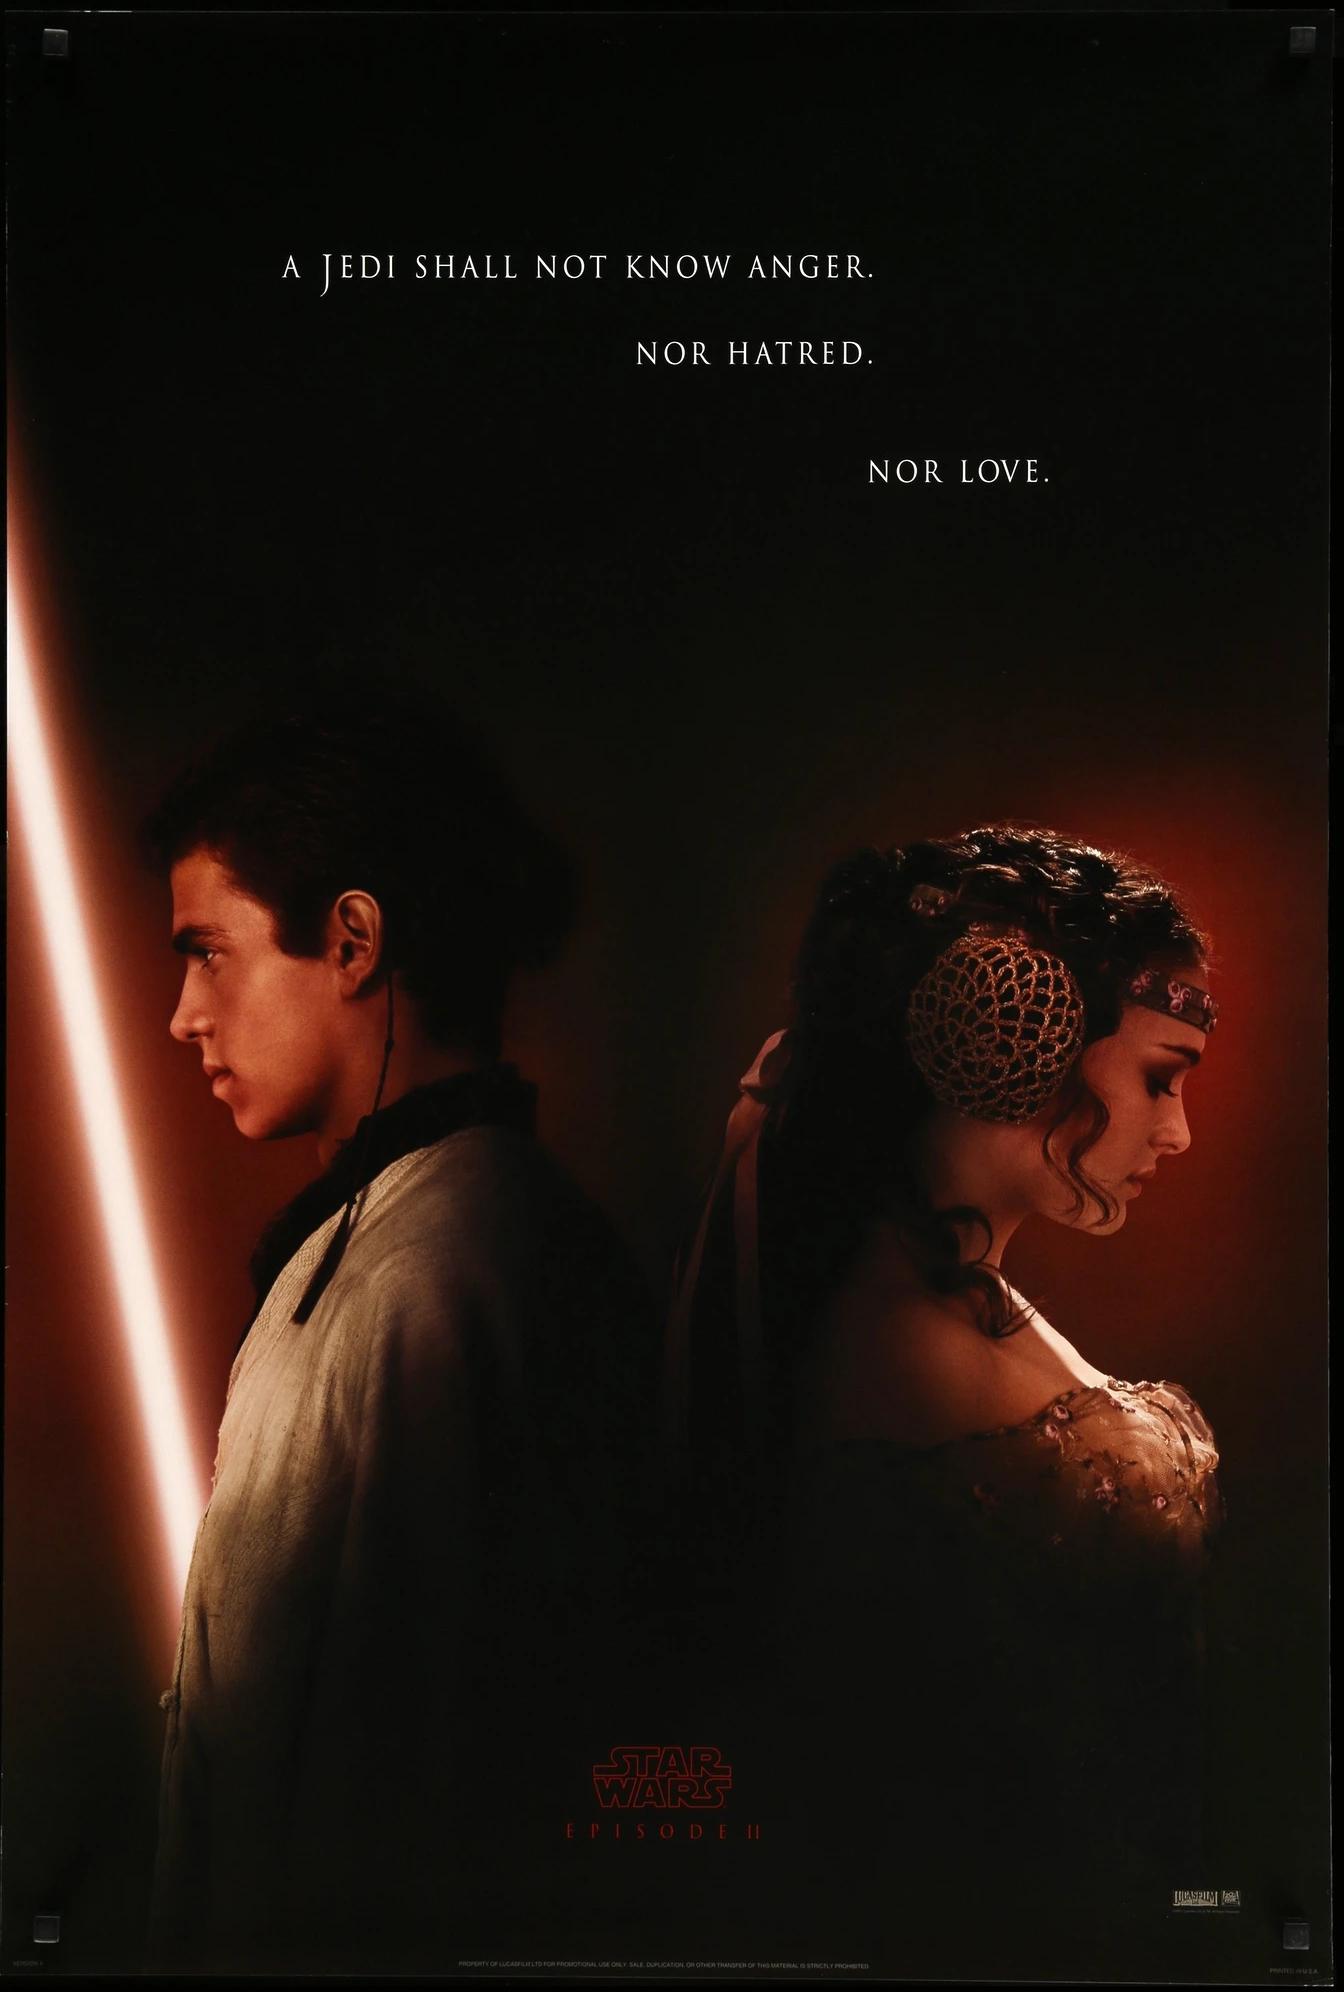 star_wars_attack_of_the_clones_2002_styleA_teaser_original_film_art